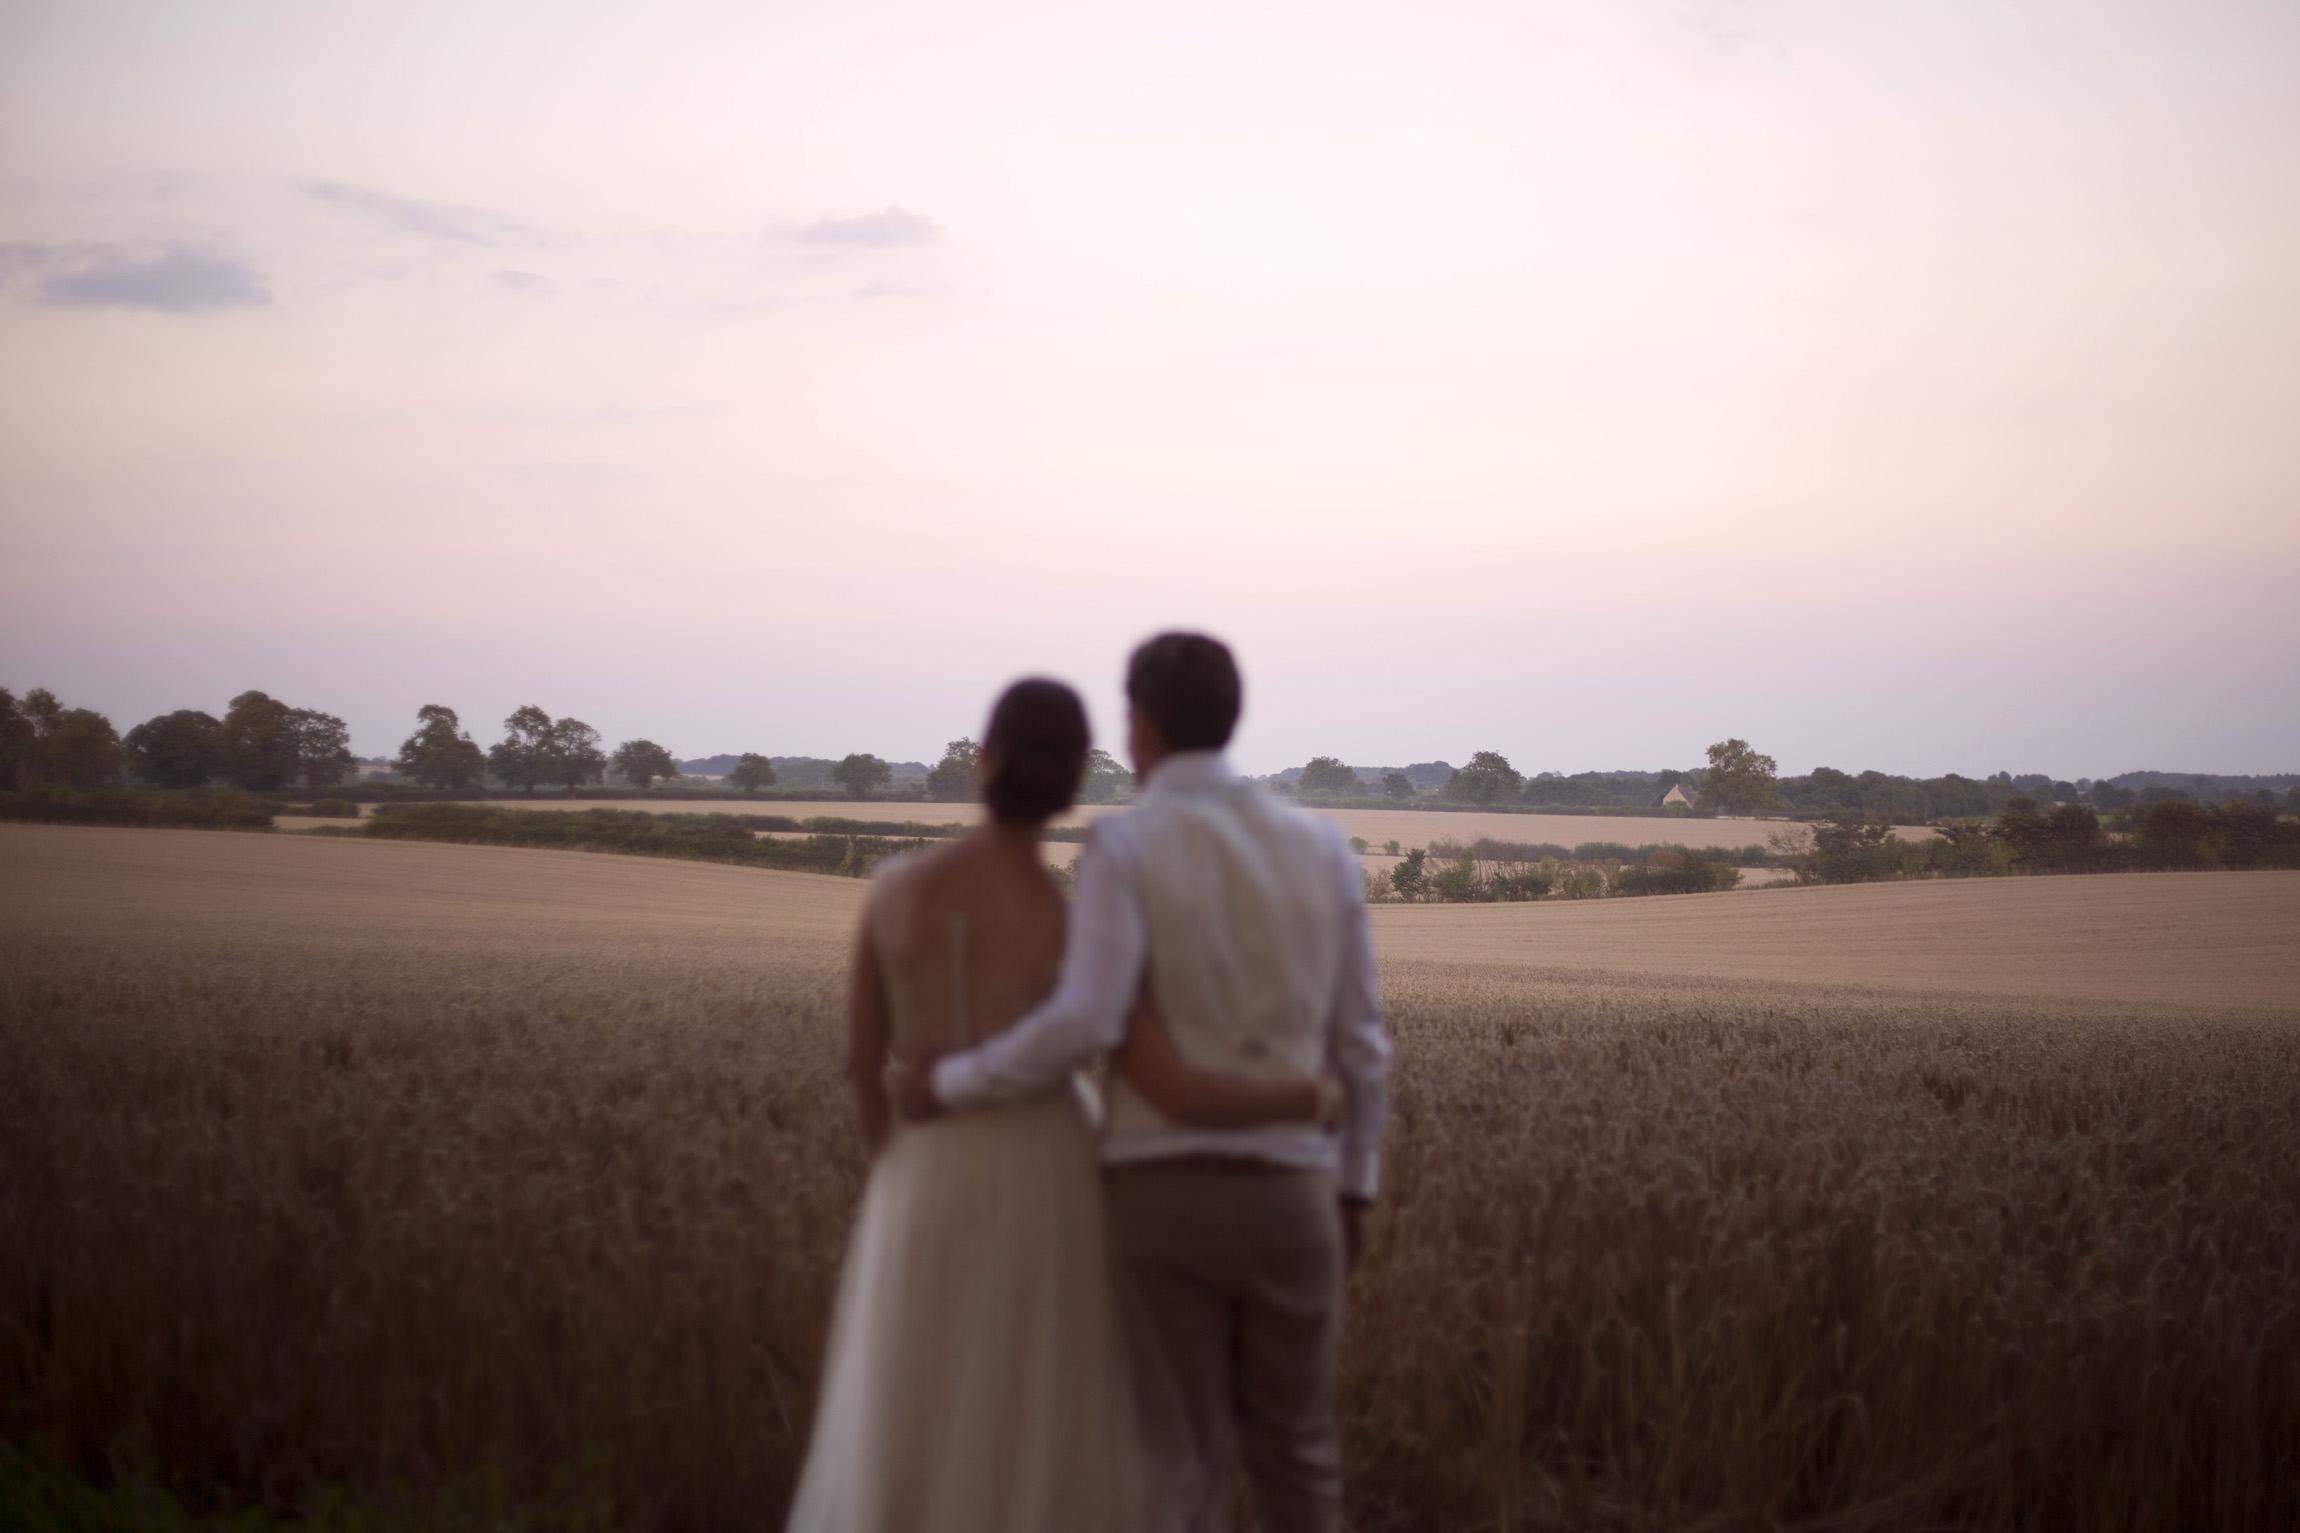 Cuddling bride and groom portrait shoot in cornfield Cripps barn outdoor wedding photographer